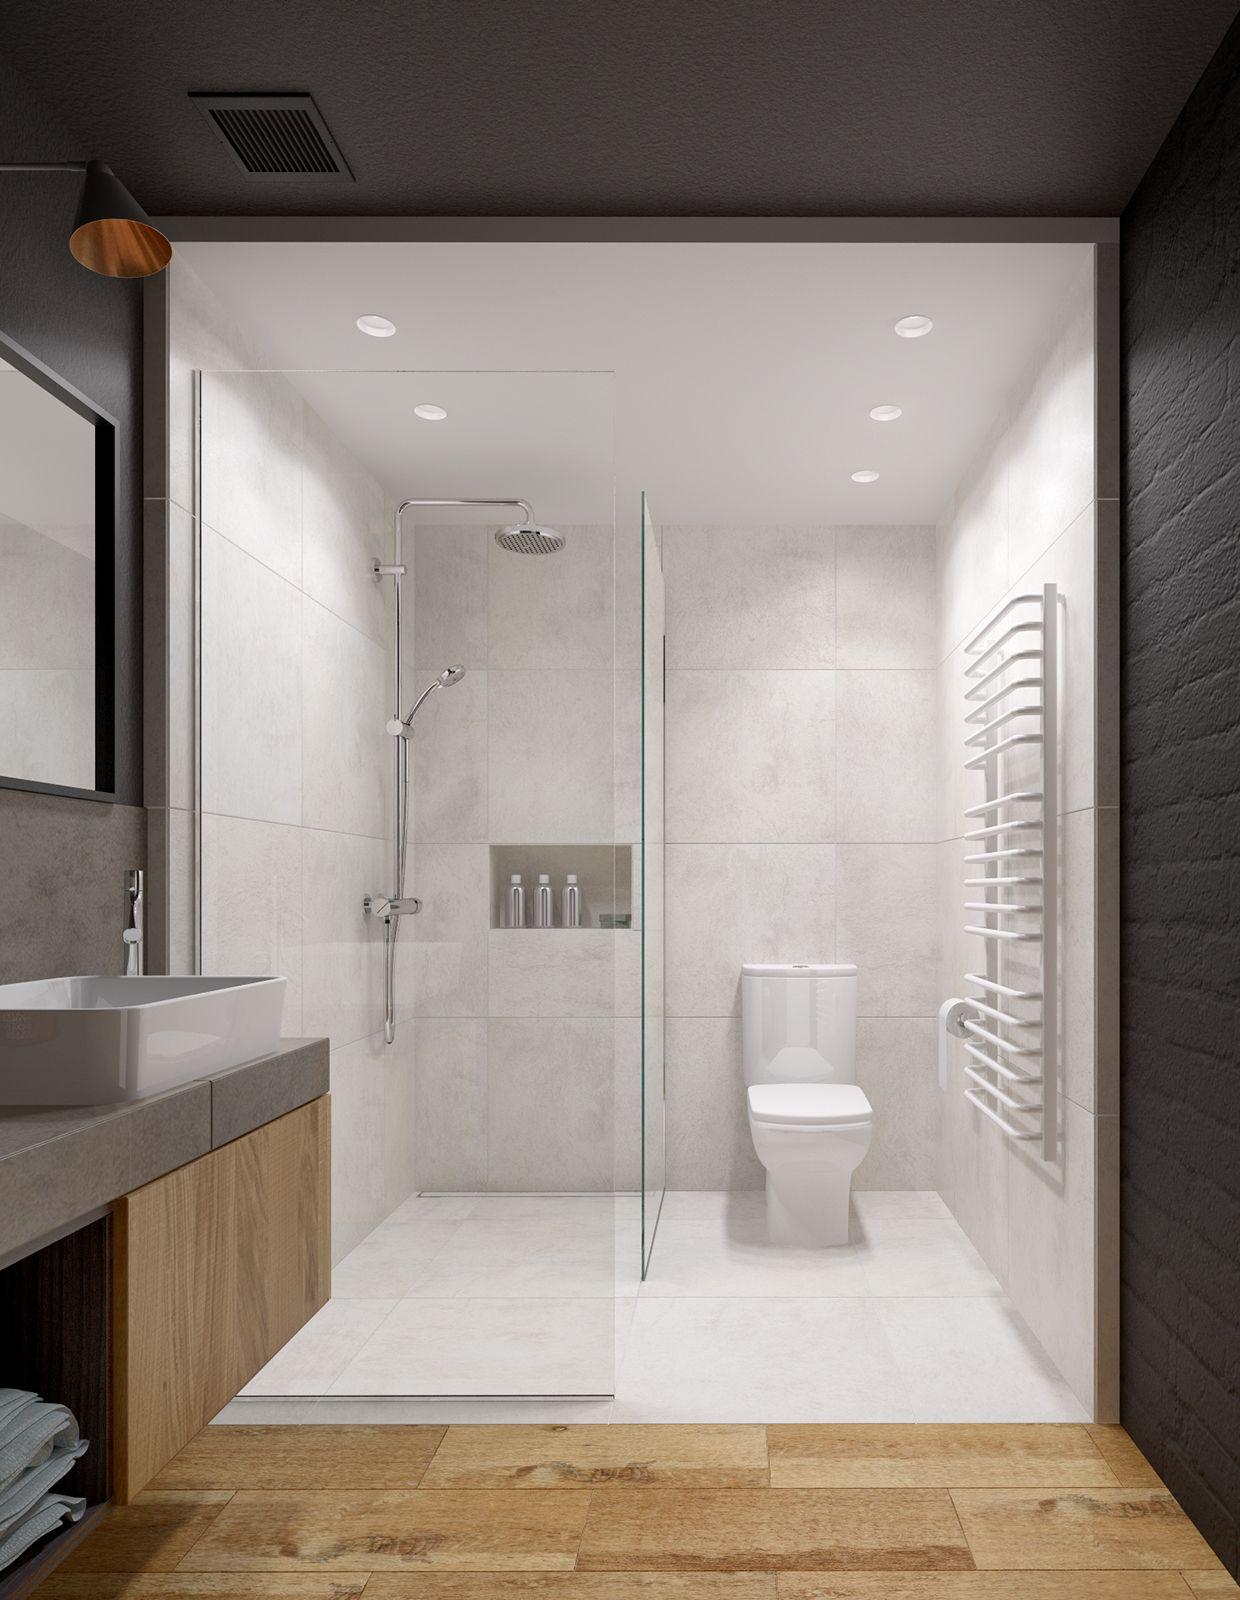 667e9dea865d37f6c68bc8aa43980c3e Narrow Rustic Bathroom Design Ideas on narrow bathroom ideas on a budget, small bathroom tile ideas, small bathroom shower ideas, den design ideas, washroom design ideas, long narrow bathroom ideas, narrow bathroom shelving ideas, narrow bathroom closet ideas, narrow half bath designs, narrow bathroom sink ideas, family room design ideas, narrow shower ideas, narrow master bathroom design, small narrow bathroom remodeling ideas, narrow bathroom design plans, narrow front porch design ideas, floor design ideas, small bathroom decorating ideas, rectangle bathroom decorating ideas,